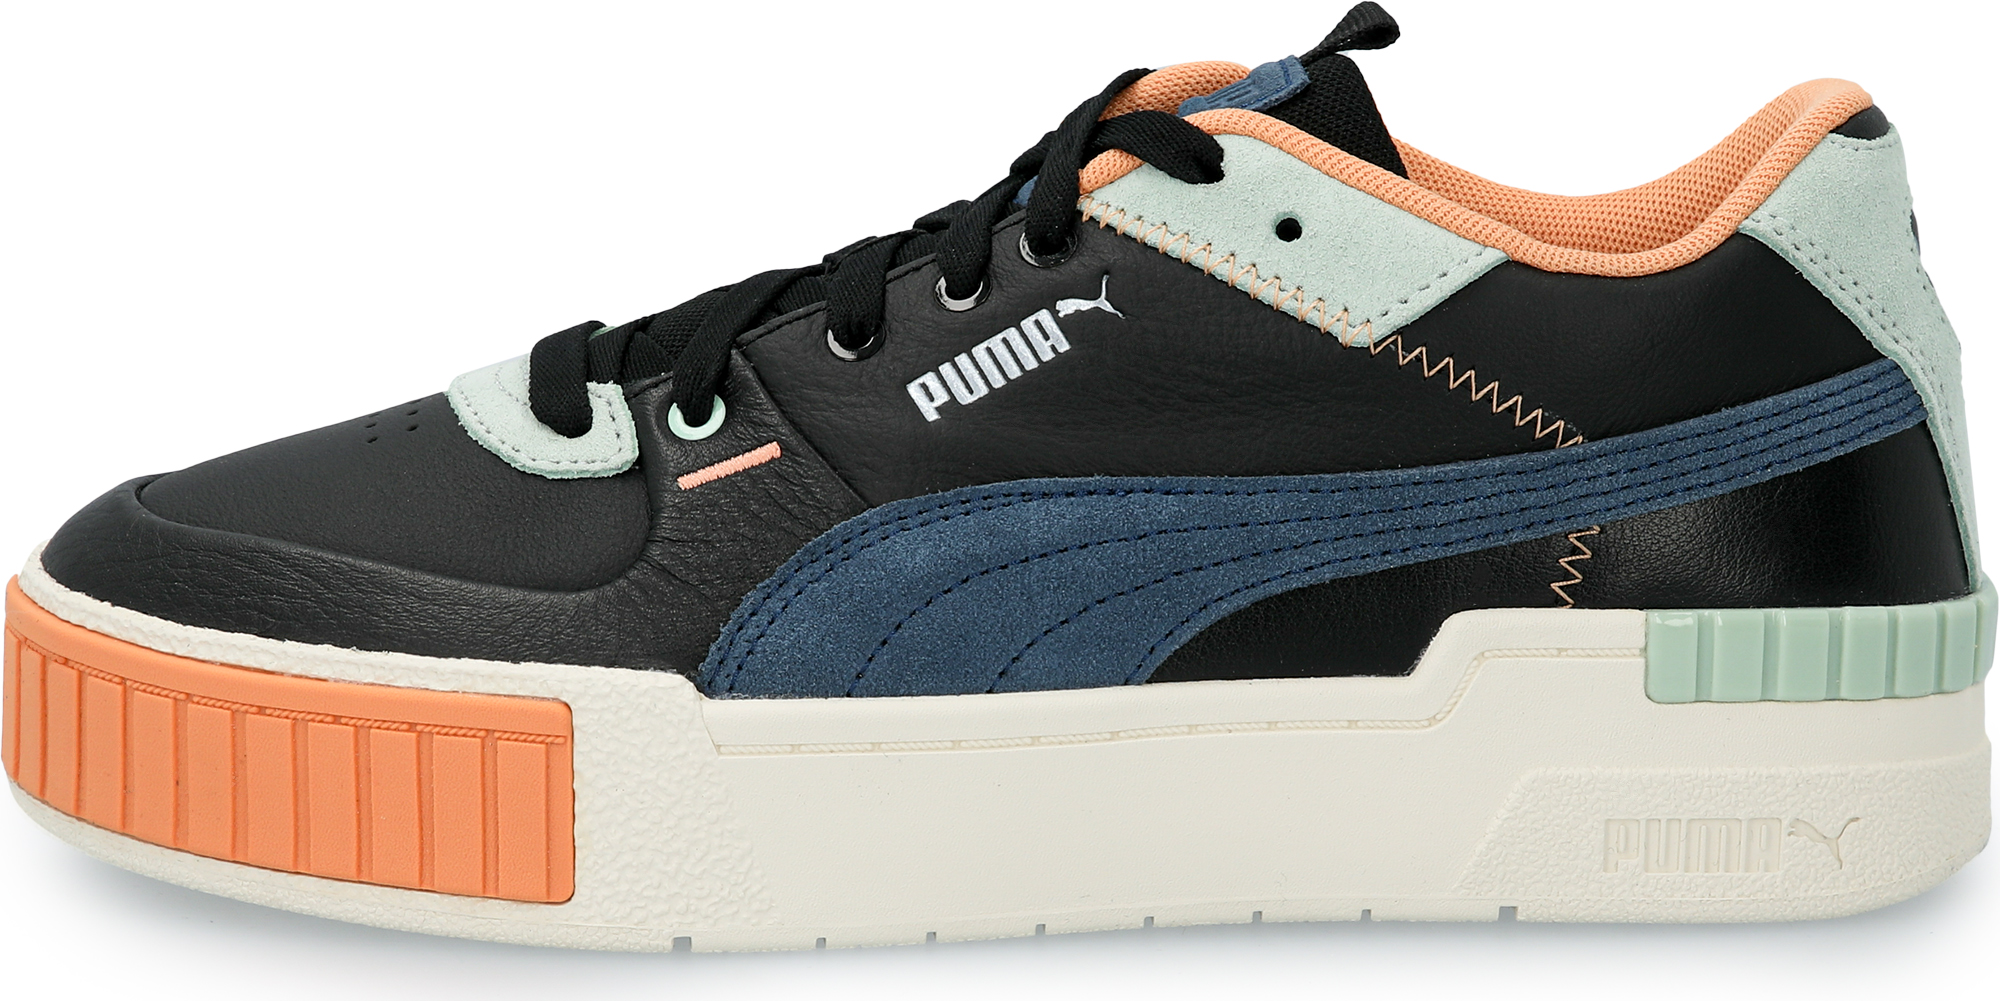 Puma Кеды женские Puma Cali Sport Mix, размер 37.5 dj natalia parís cali